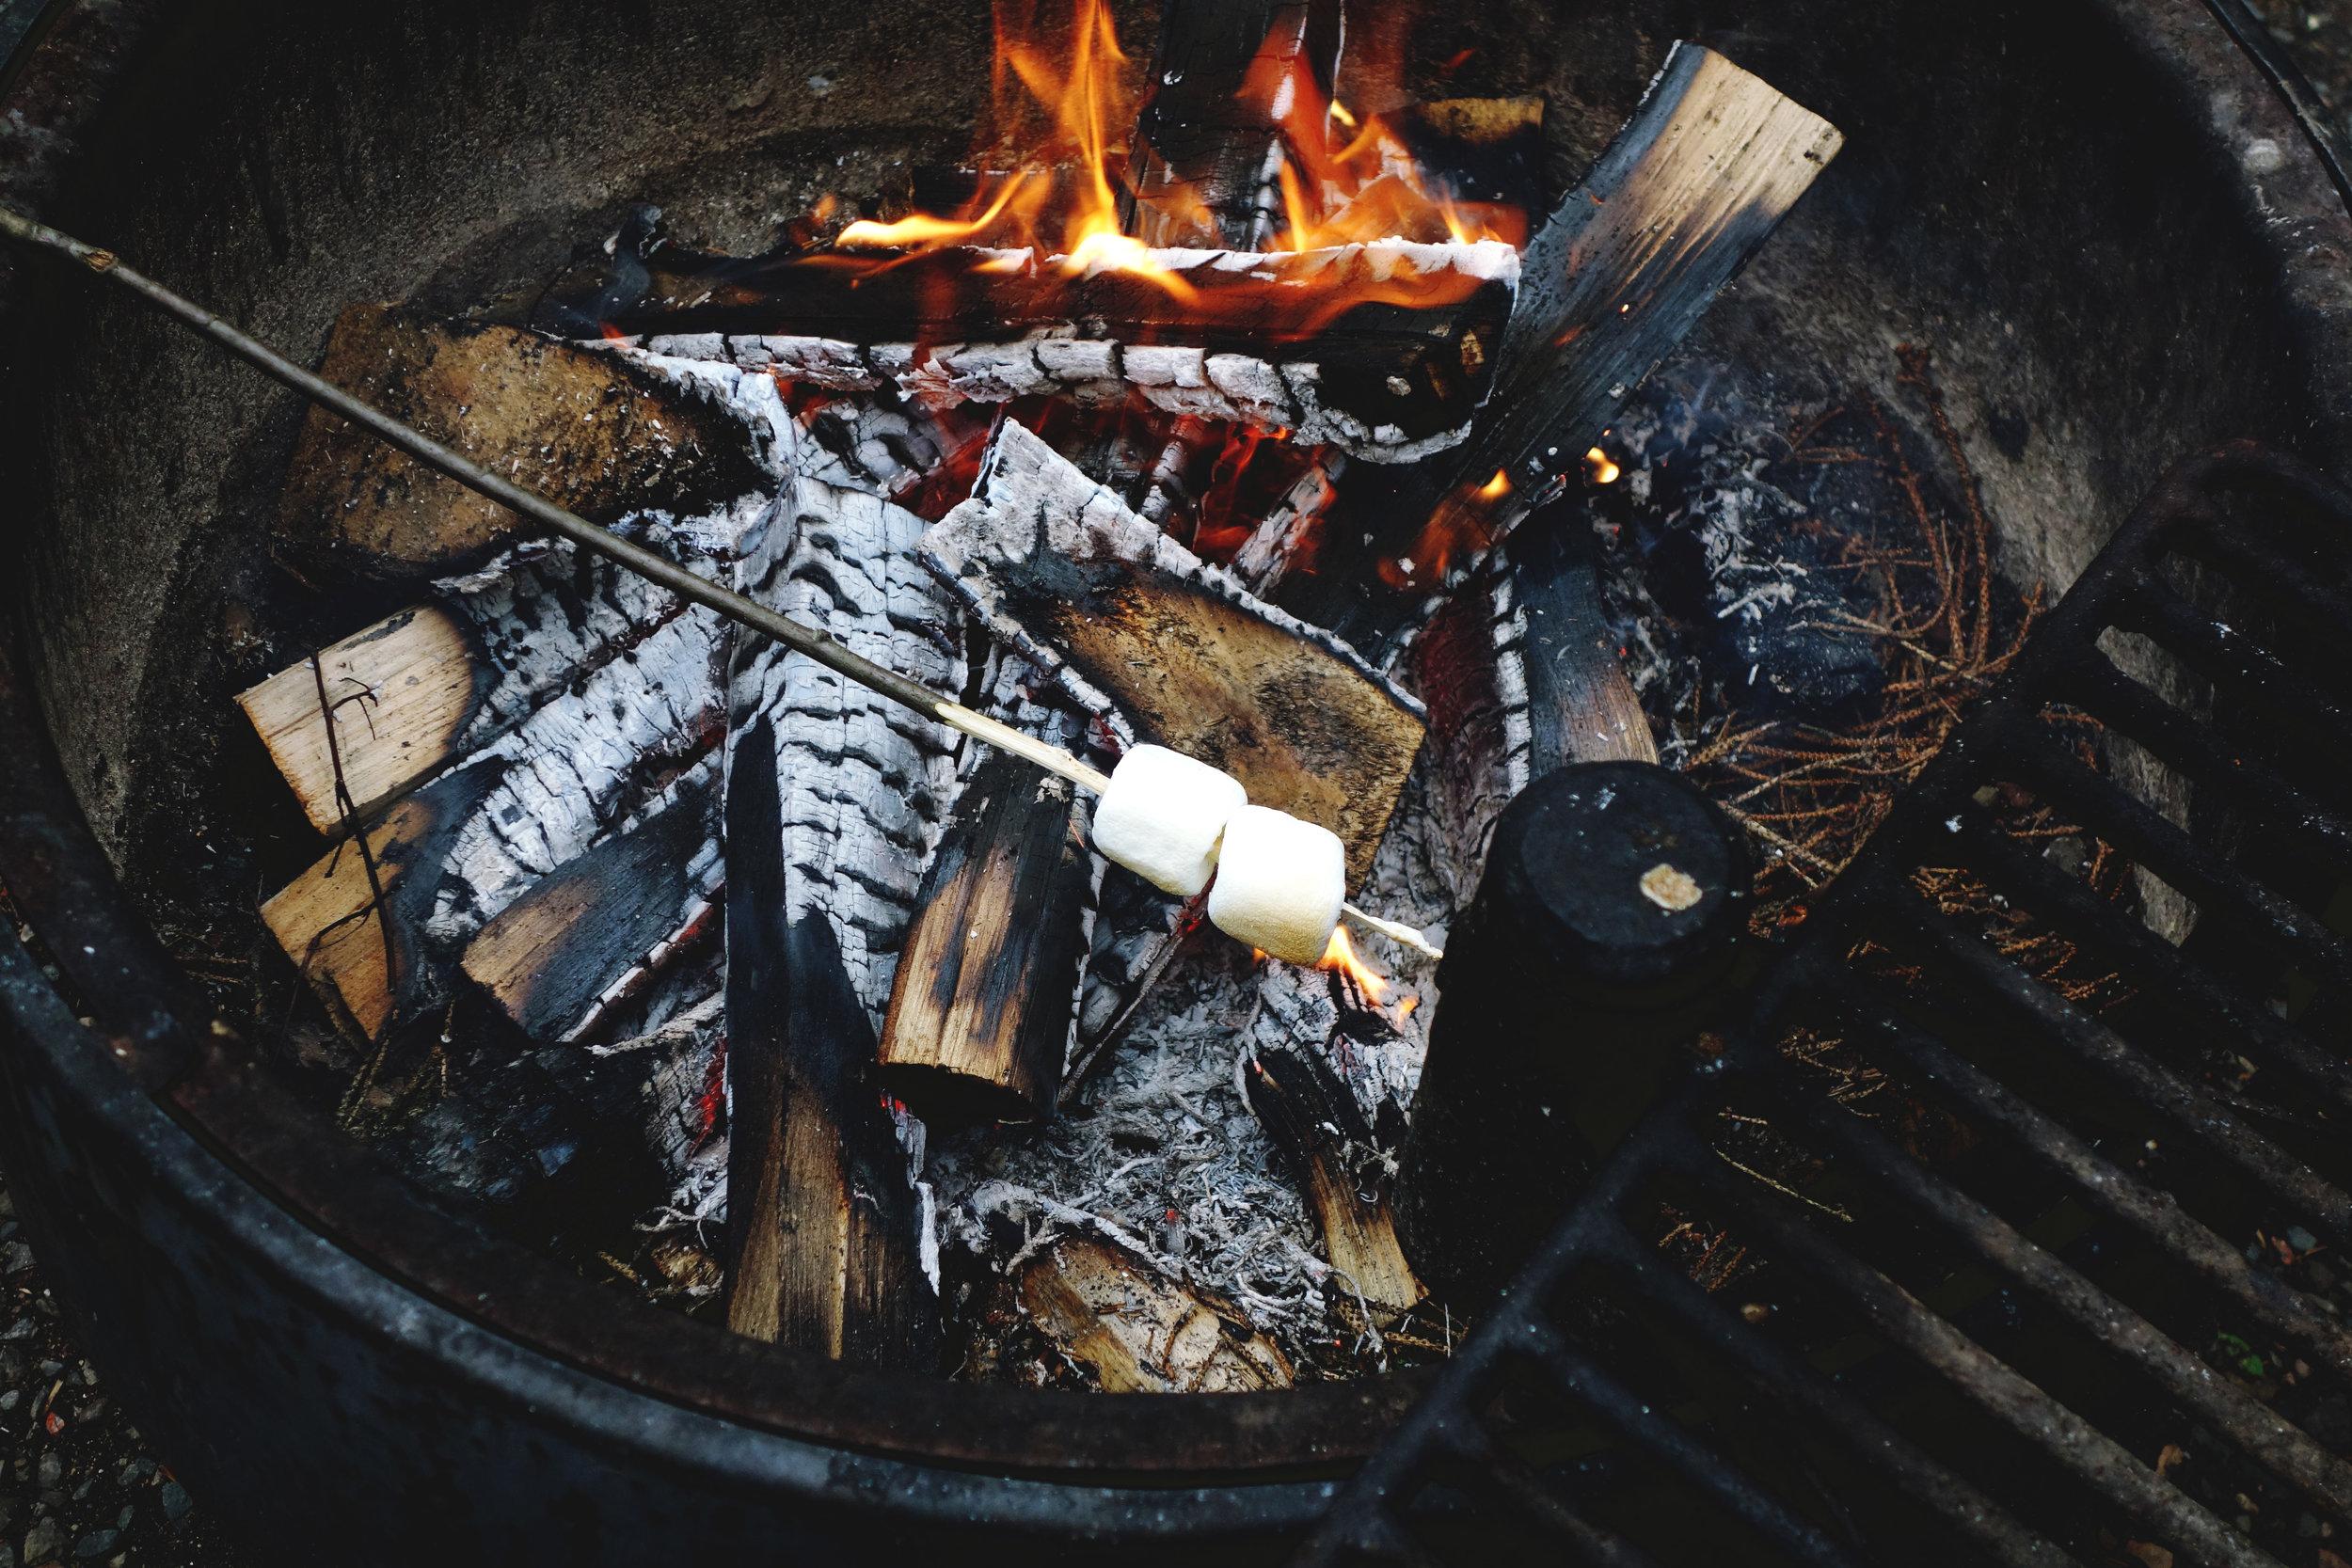 roasting marshmallows.jpg